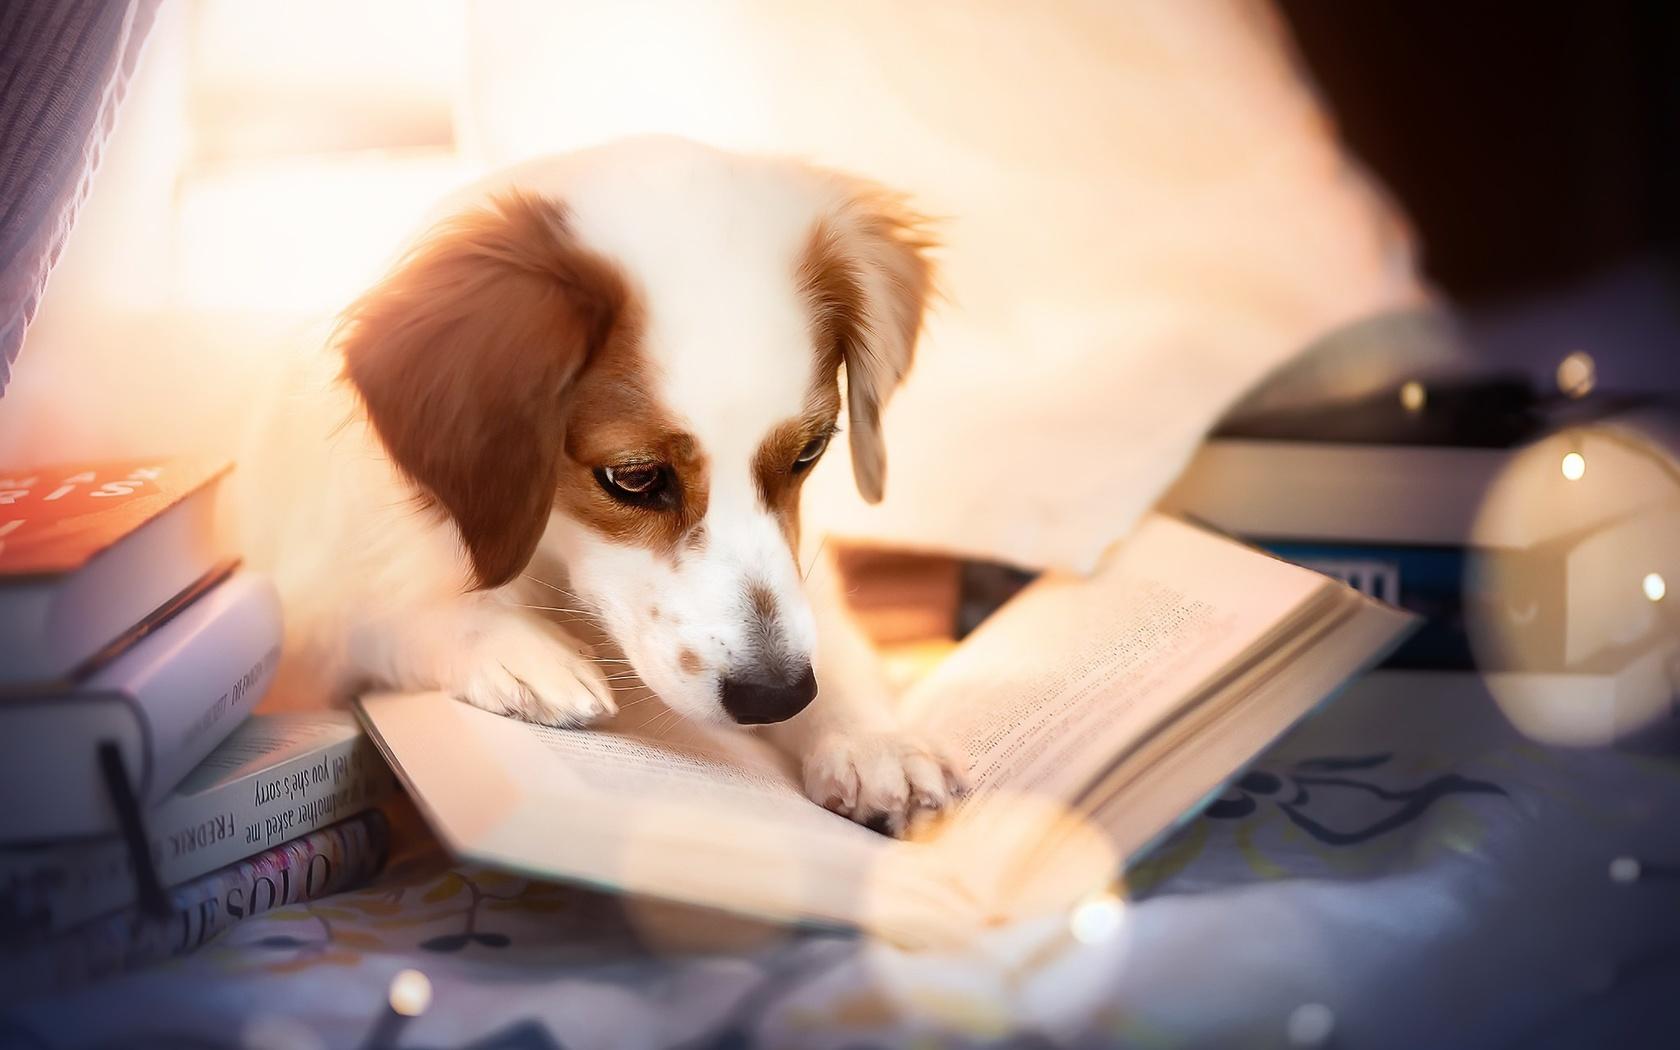 животное, собака, пёс, книги, свет